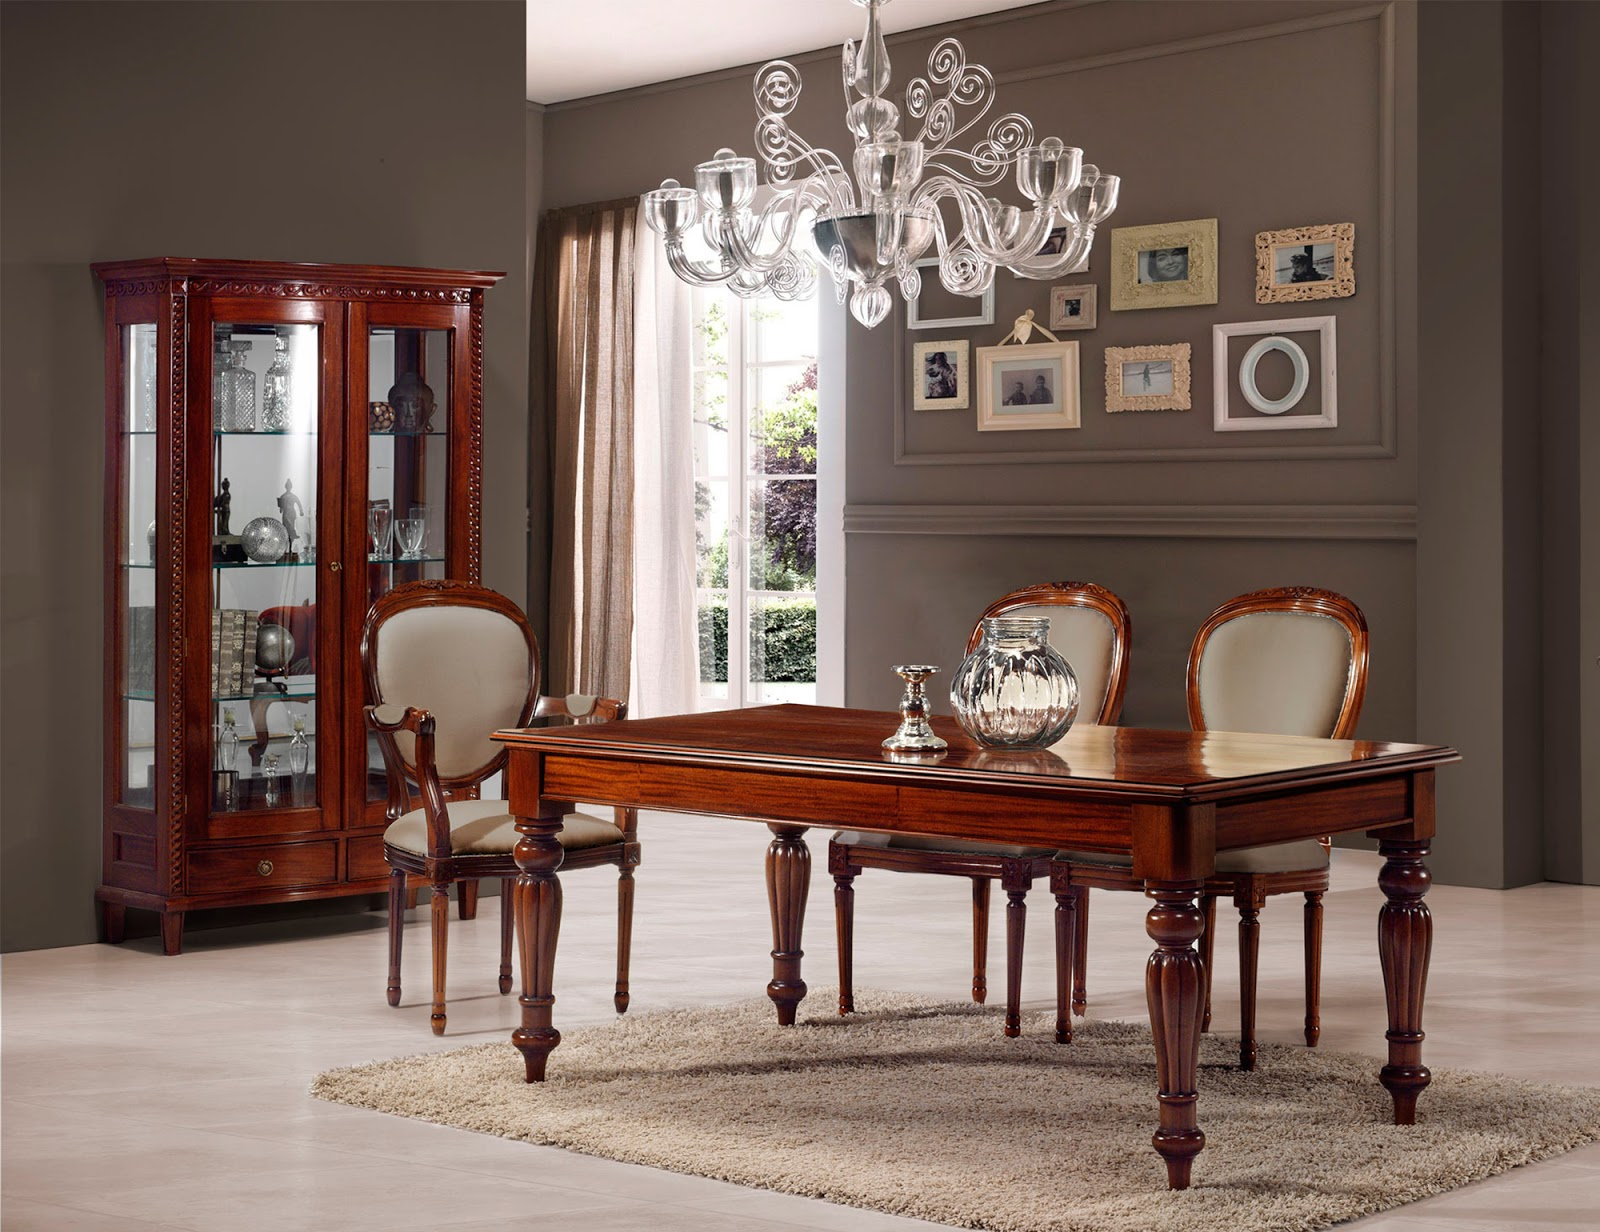 Muebles de comedor 10 comedores con vitrina - Comedor con vitrina ...